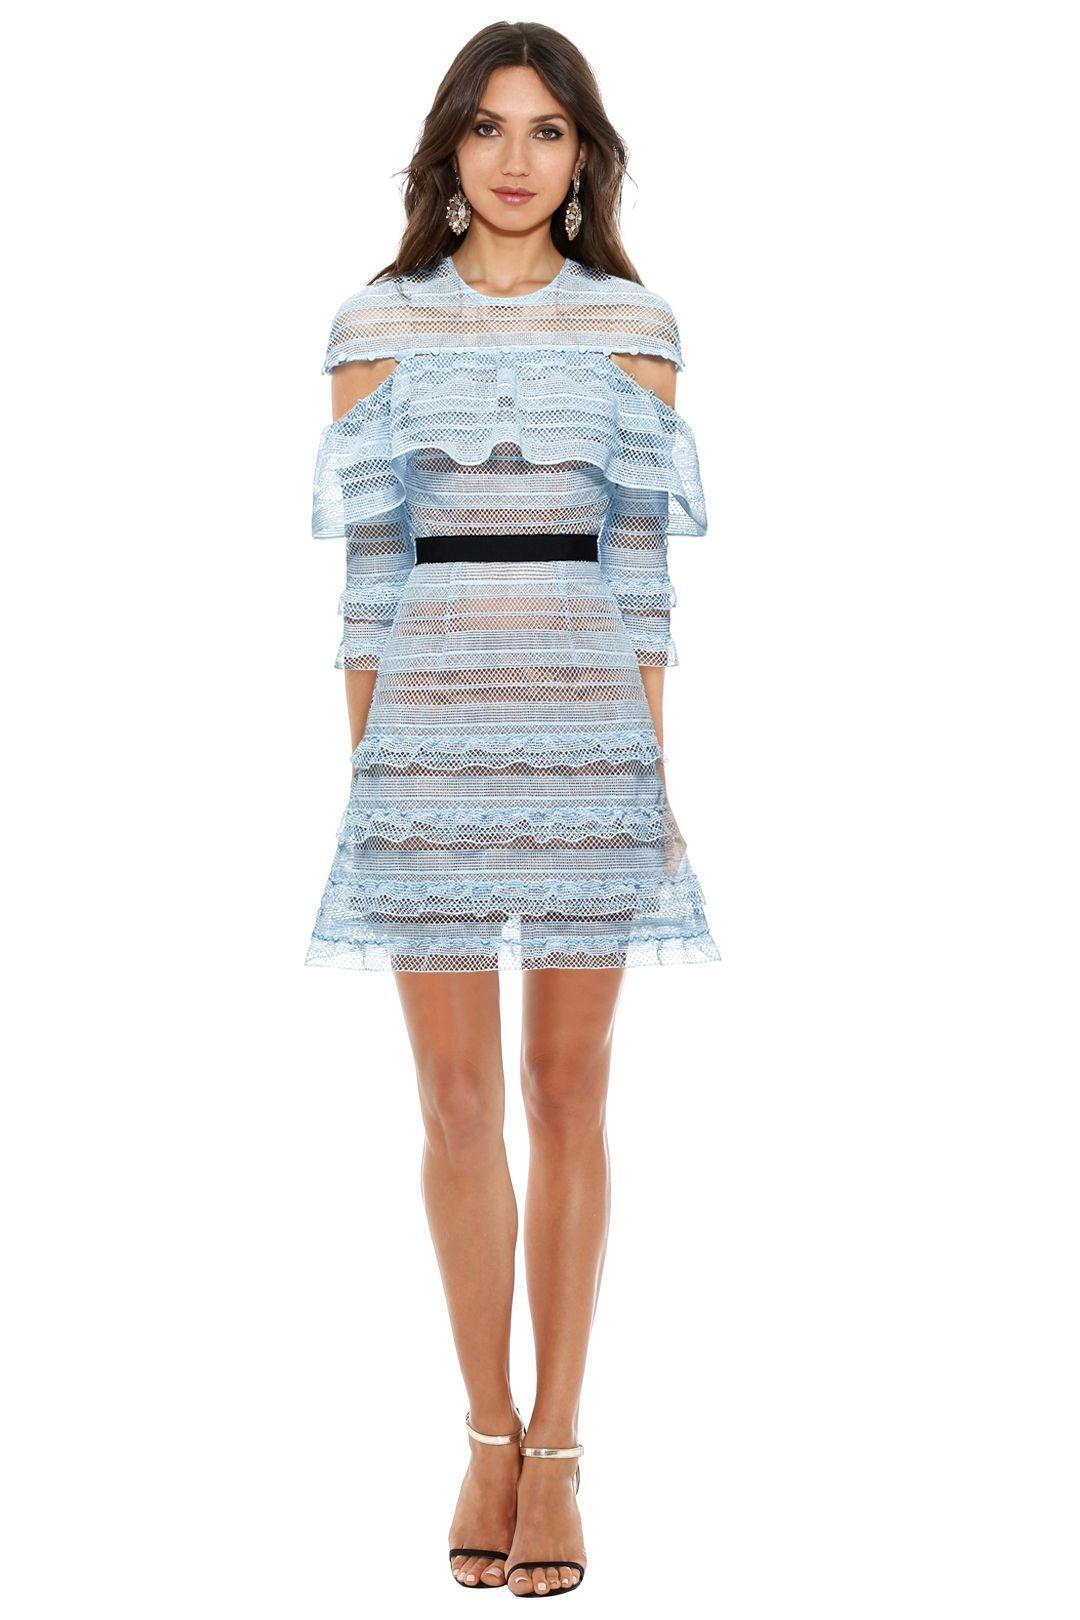 Self Portrait - Stripe Grid Mini Dress - Blue - Front